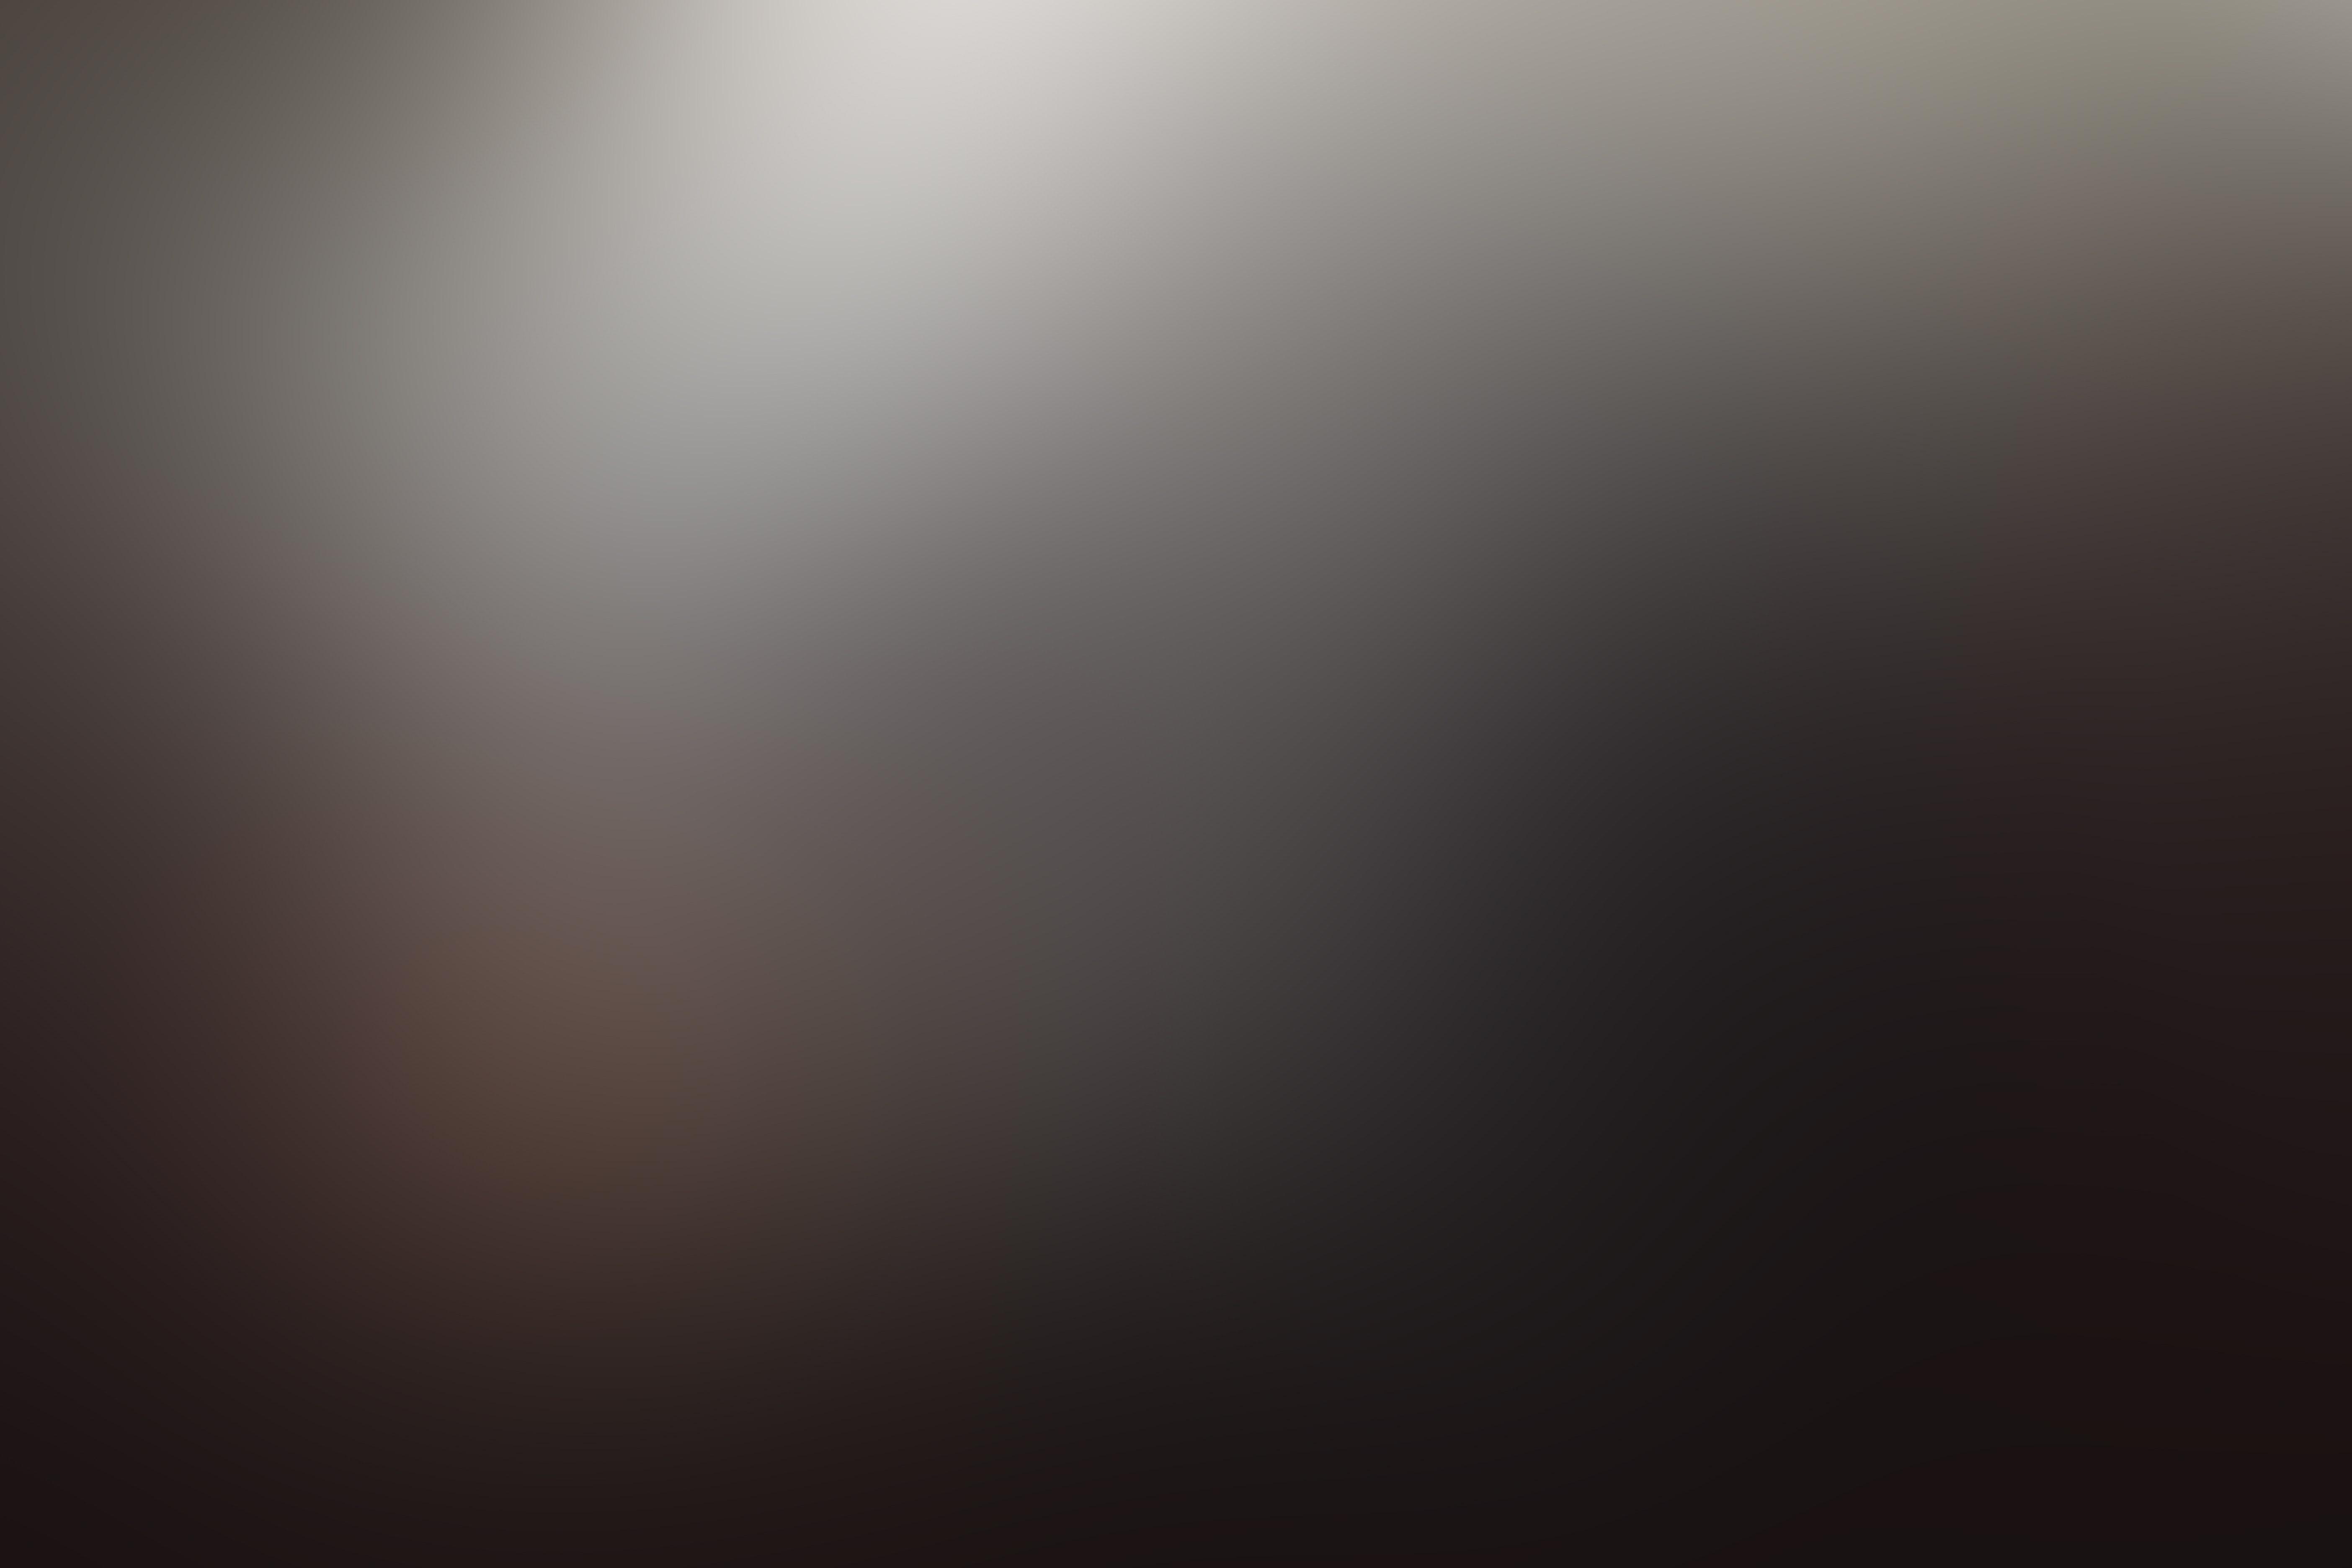 blur images pexels free stock photos